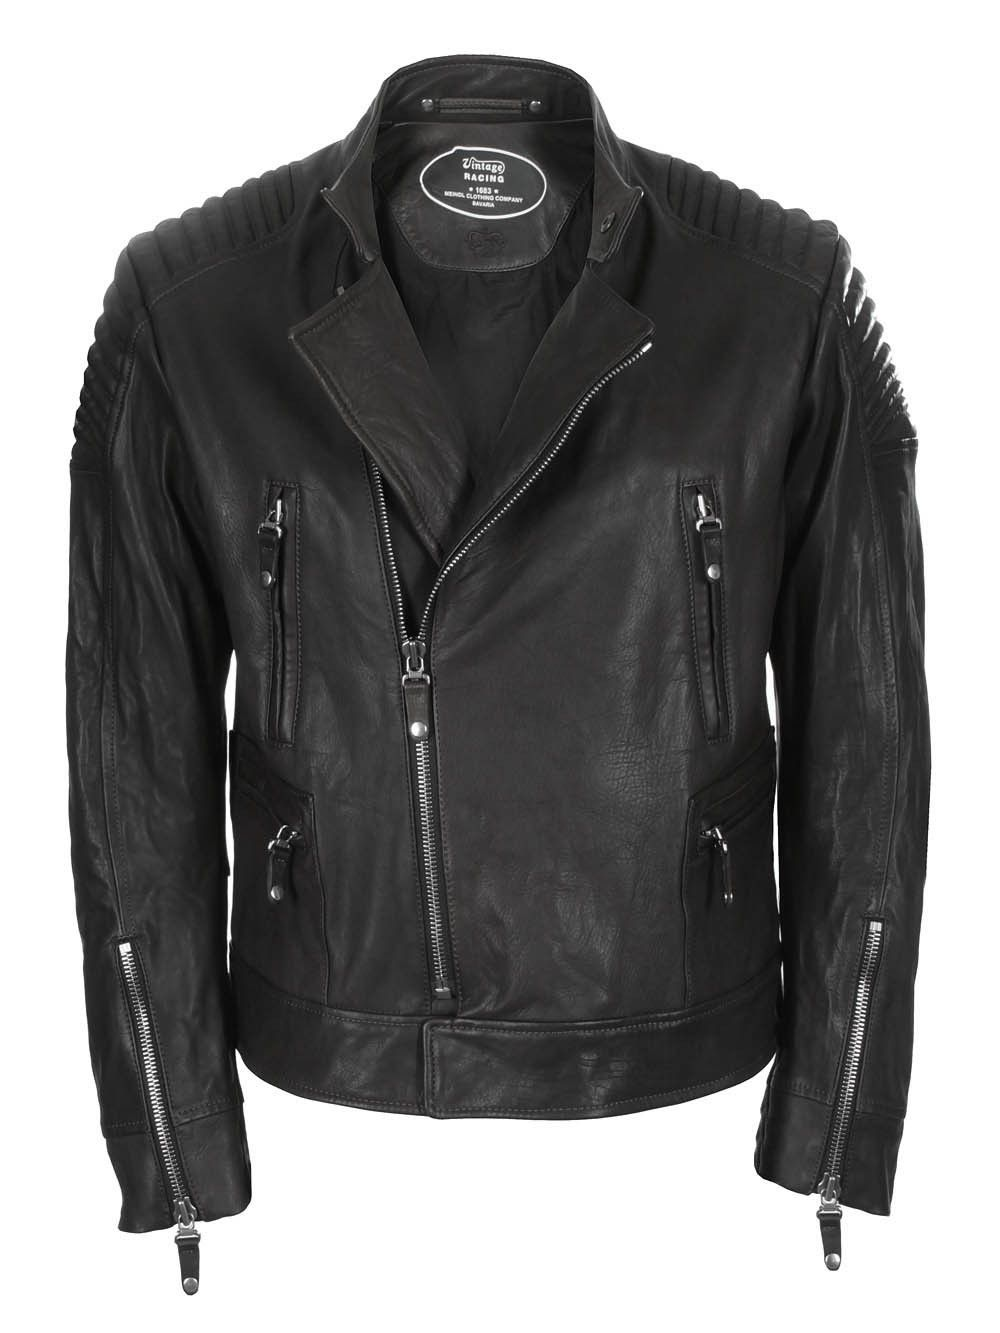 Meindl Lederjacke Redwoods black   Jacken, Lederjacke und